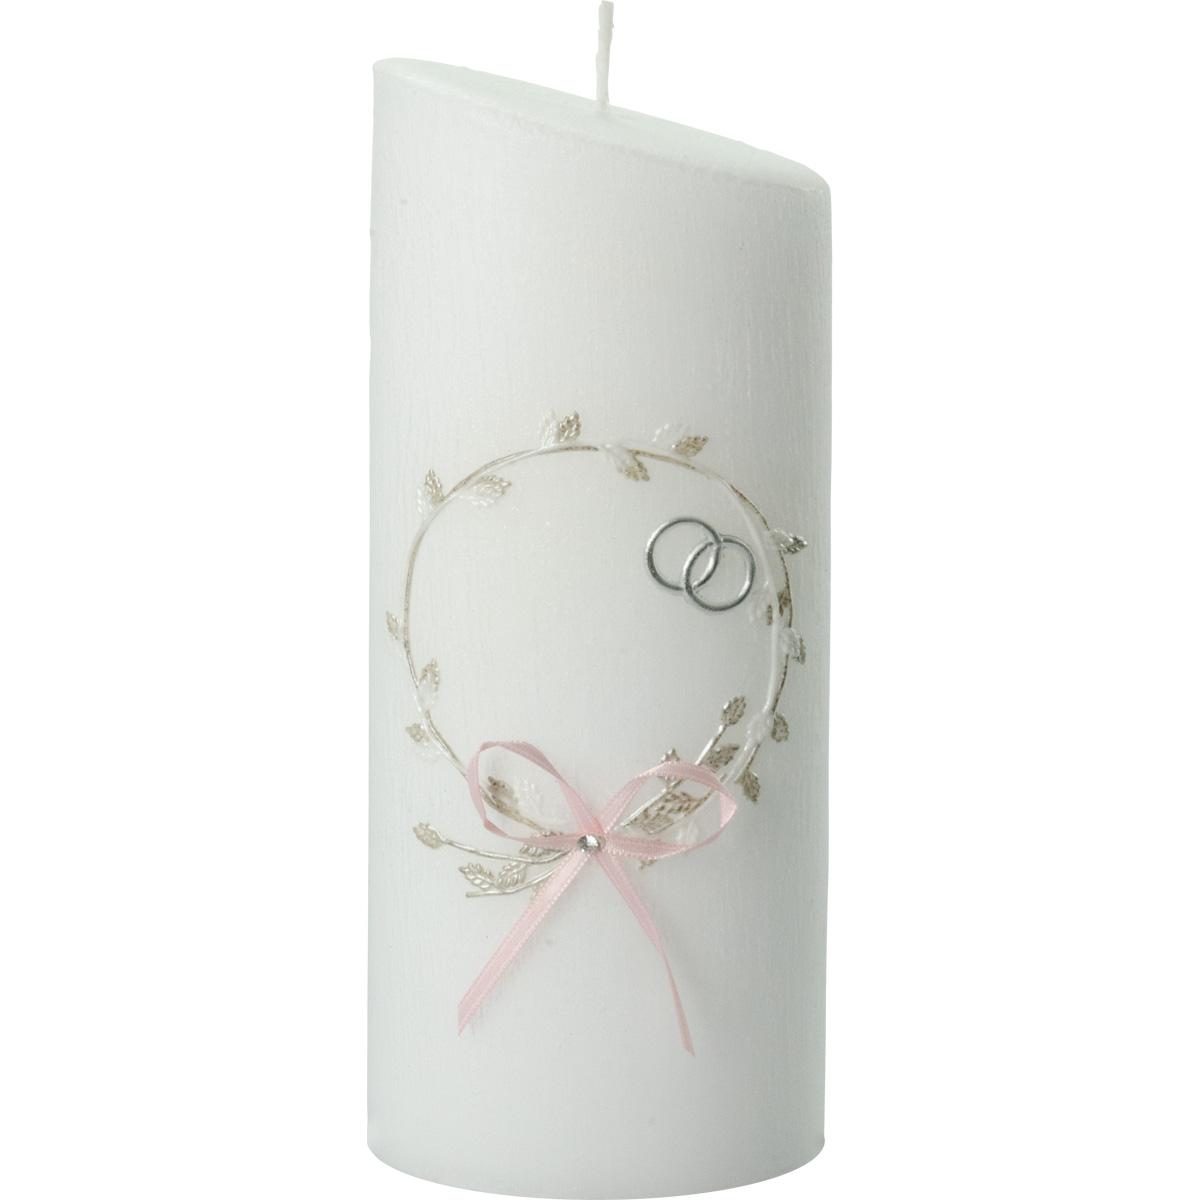 Hochzeitskerze, 5016, Oval 230x90x60, Struktur, rosa Schleife, silber